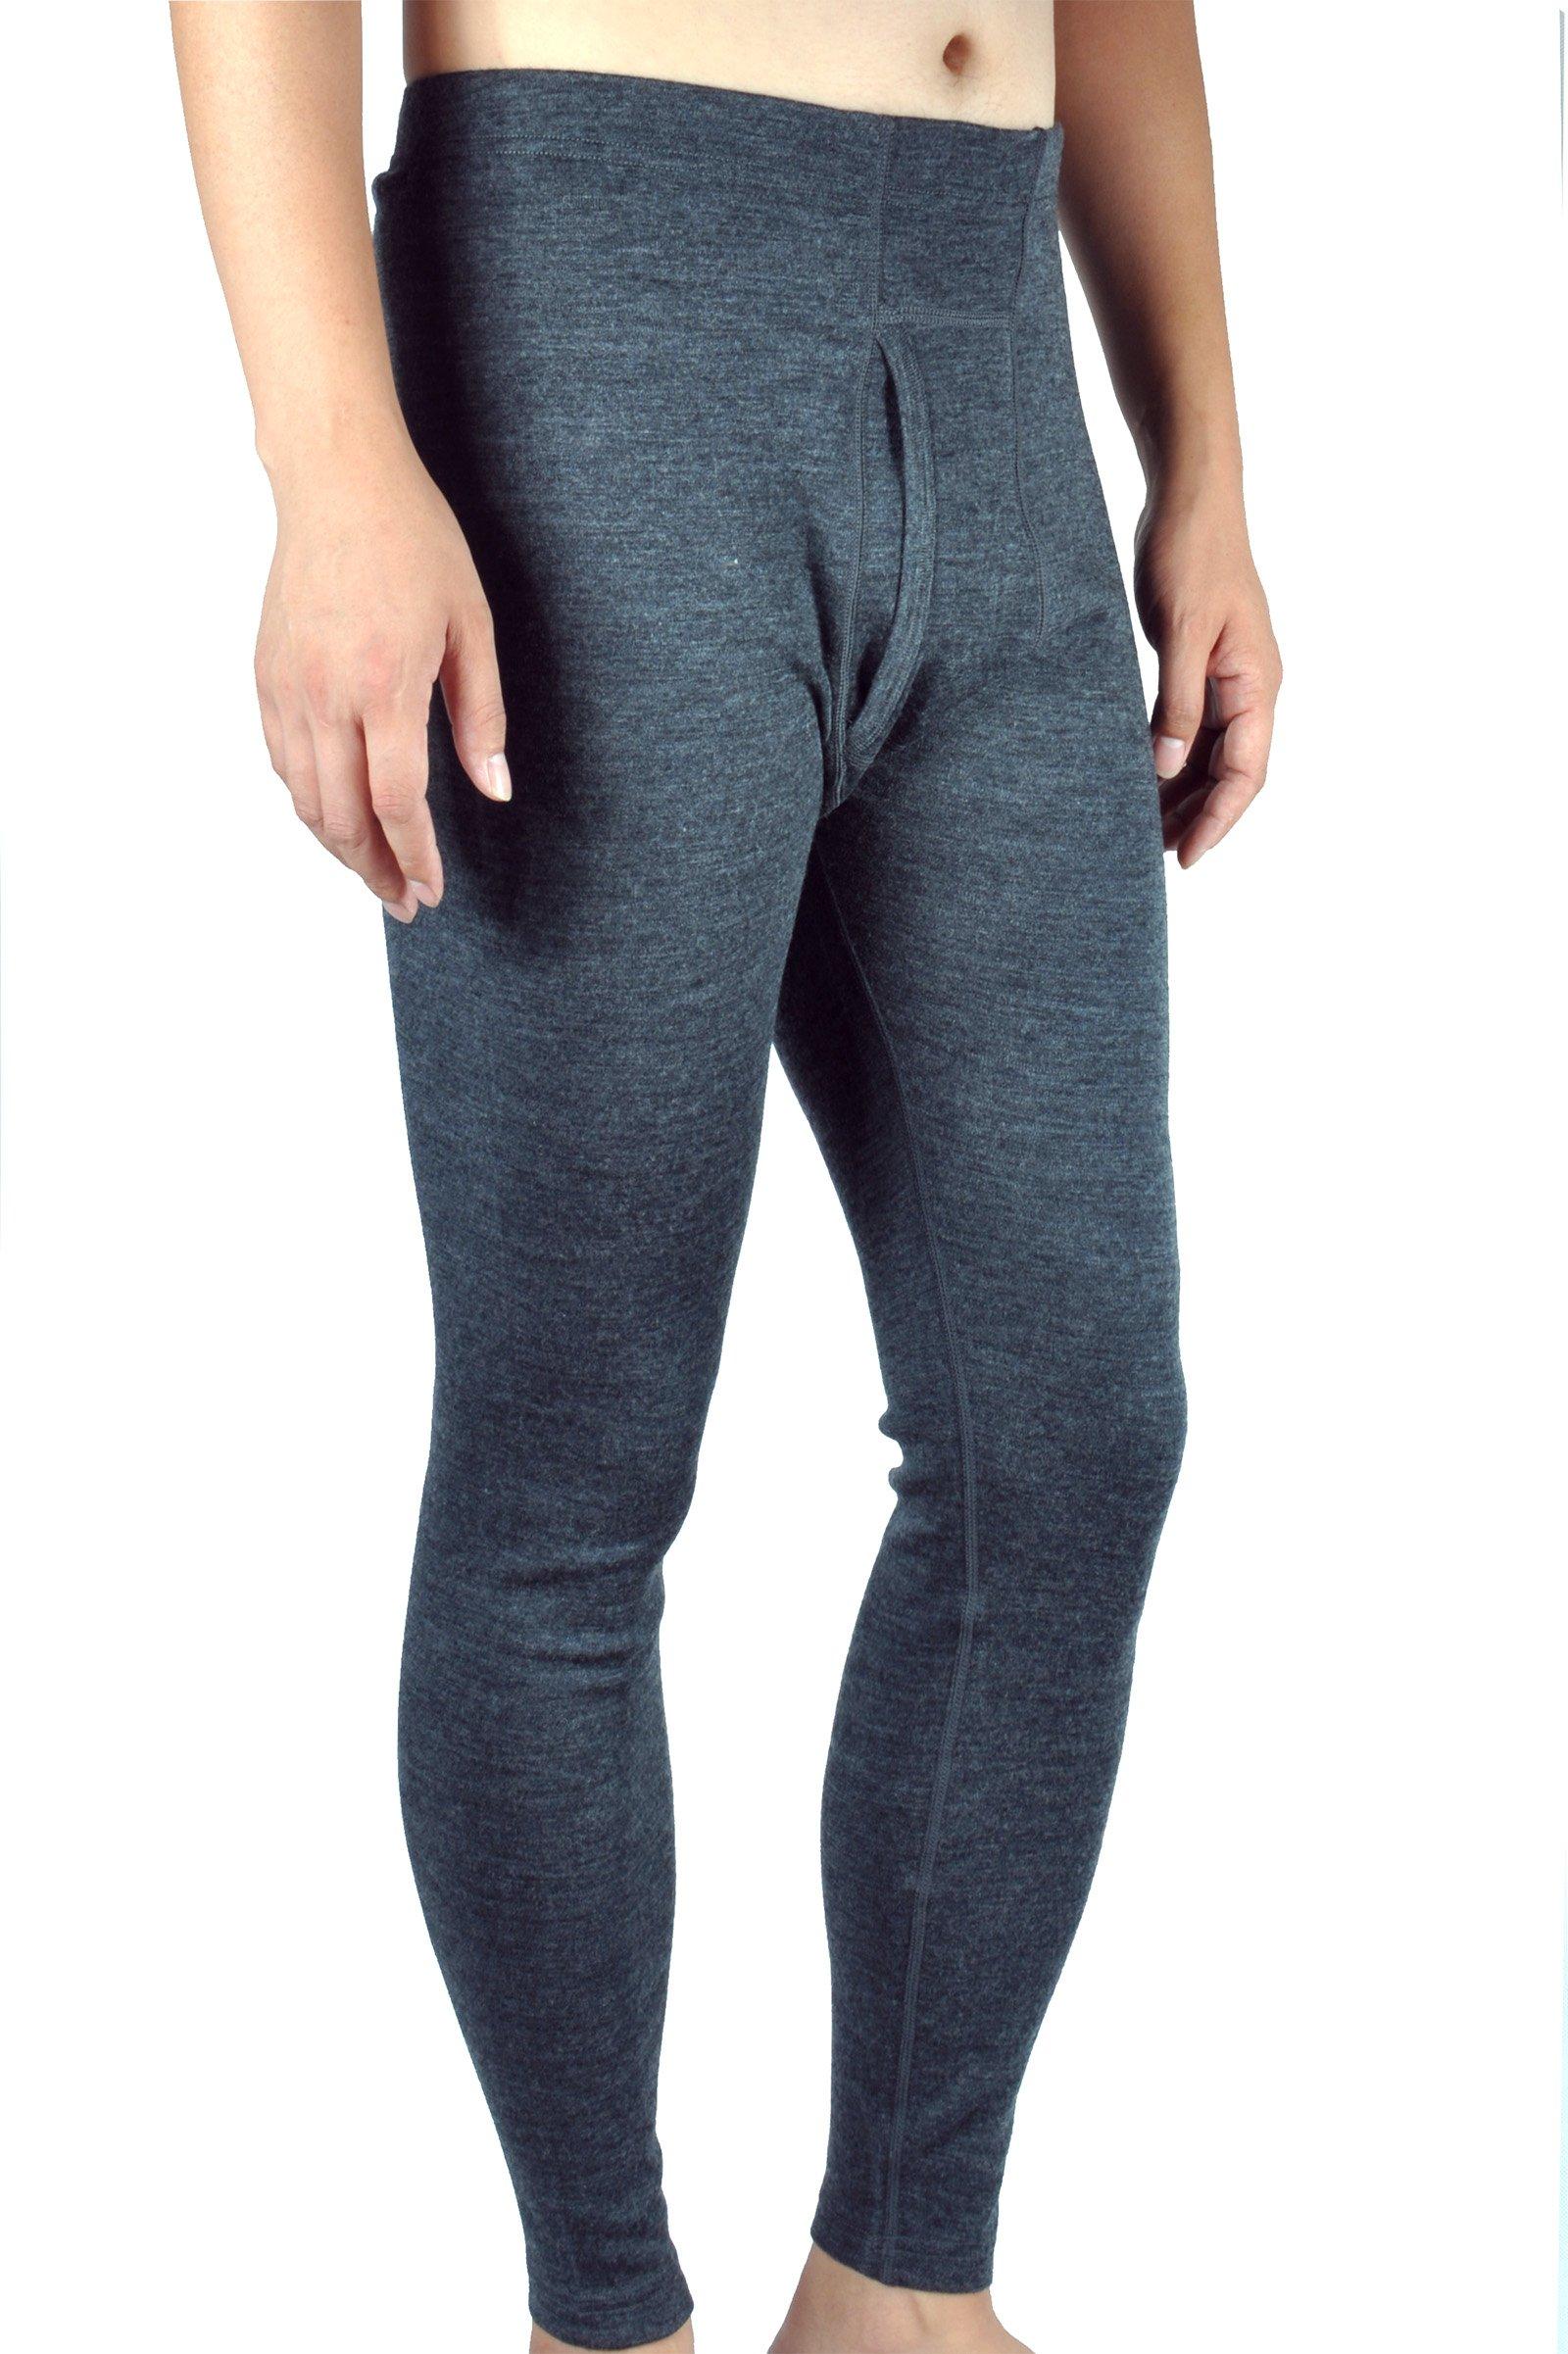 100% Merino Wool Men's Midweight Base Layer Thermal Underwear Bottoms Pants Long John (M, Charcoal Gray) by Sheep Run